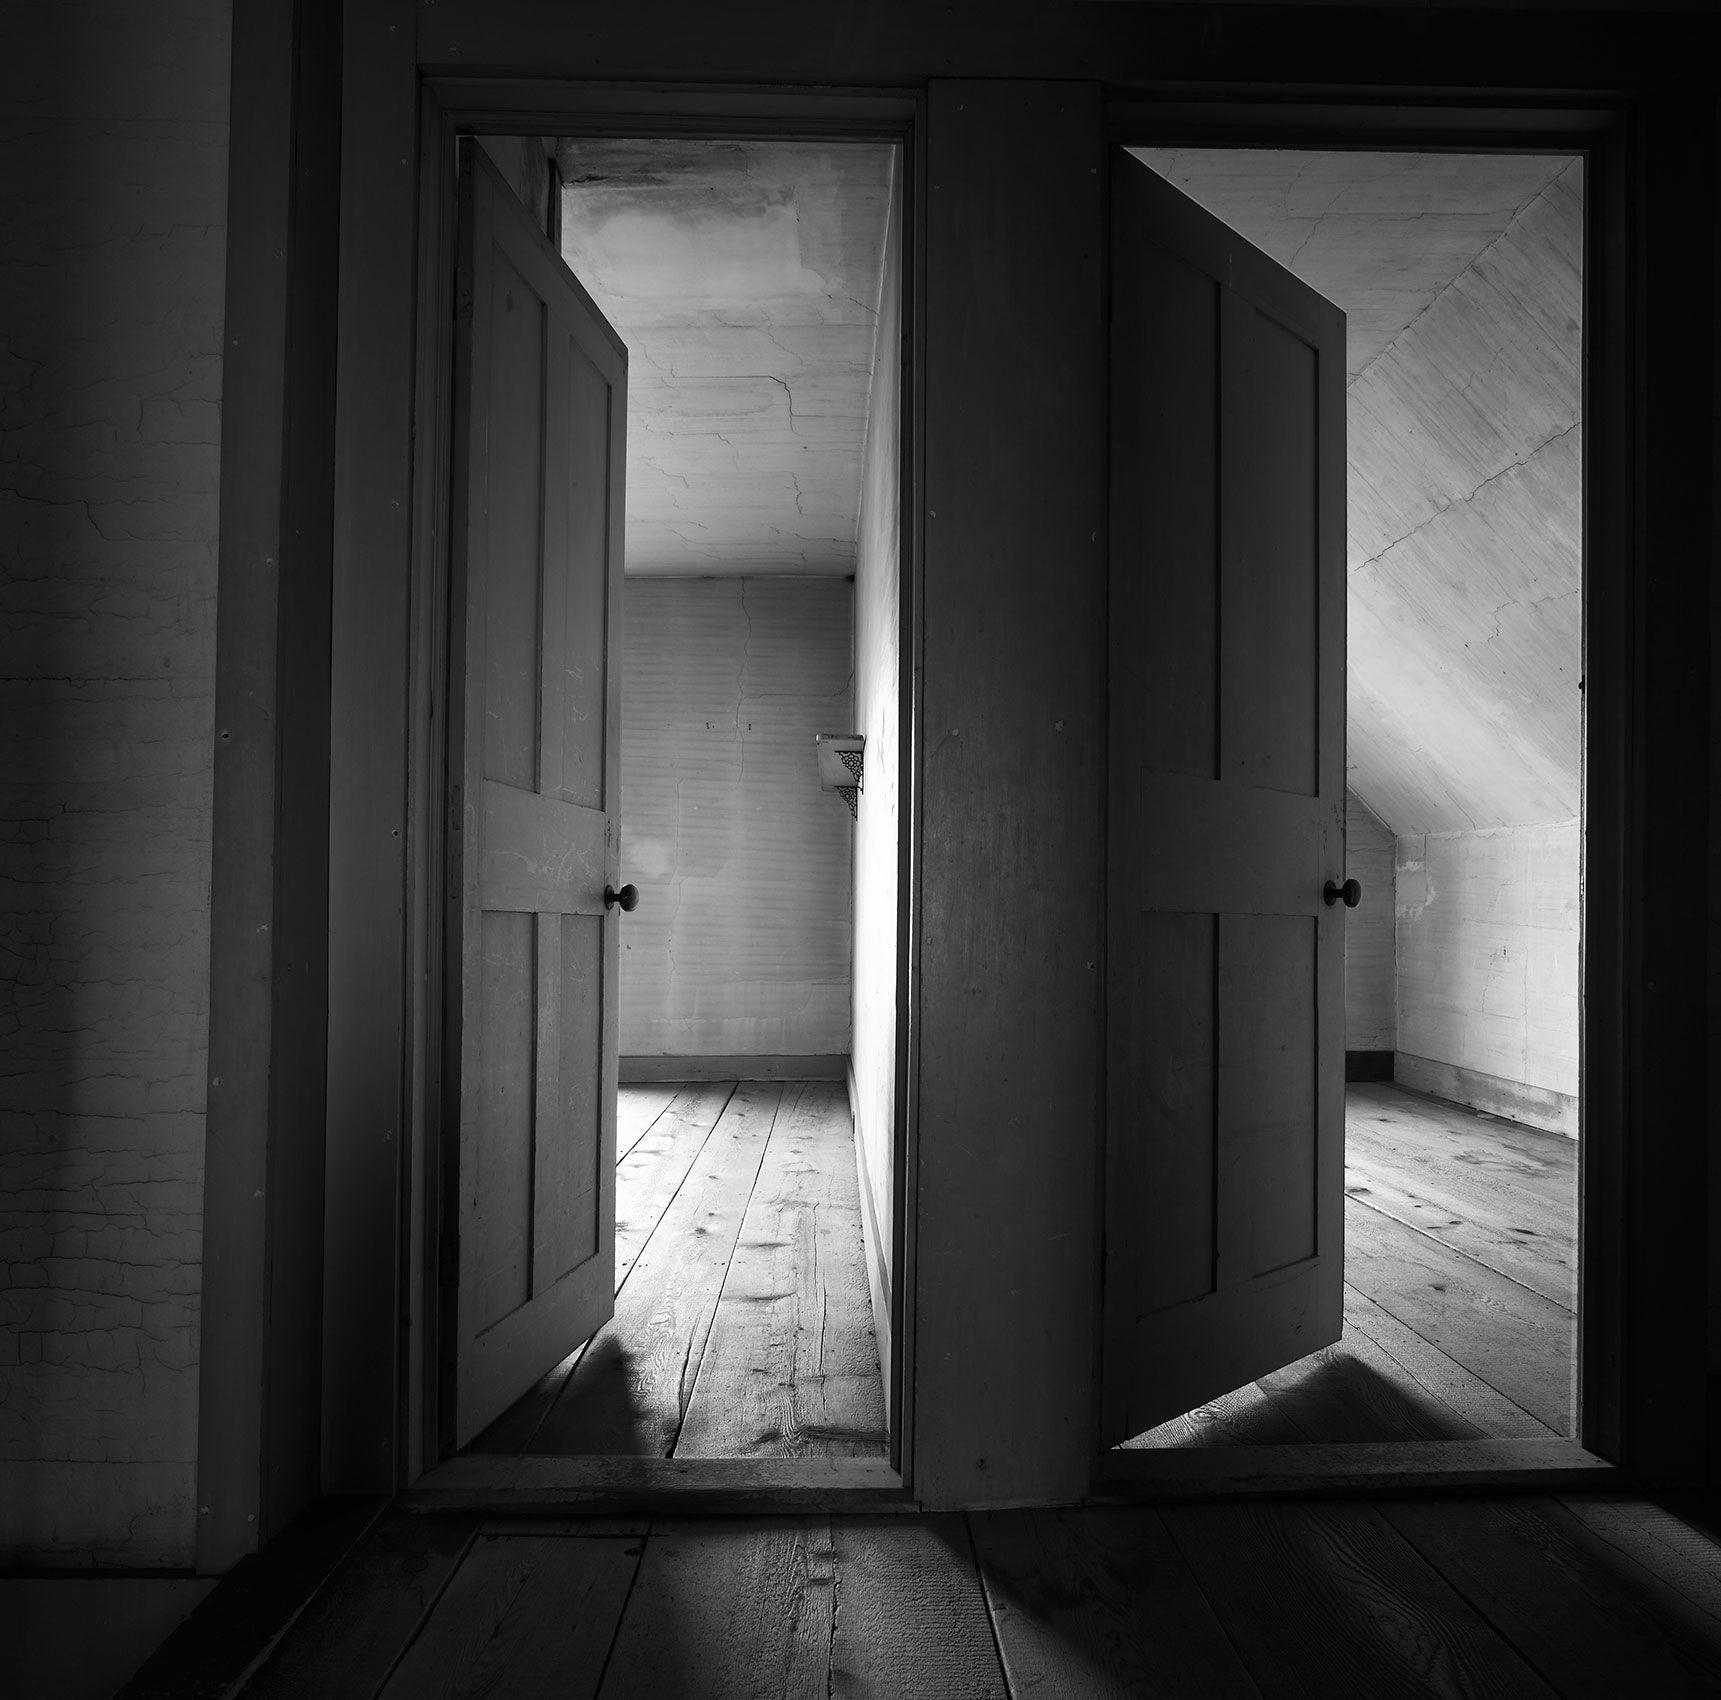 olson-house-doors-final.jpg